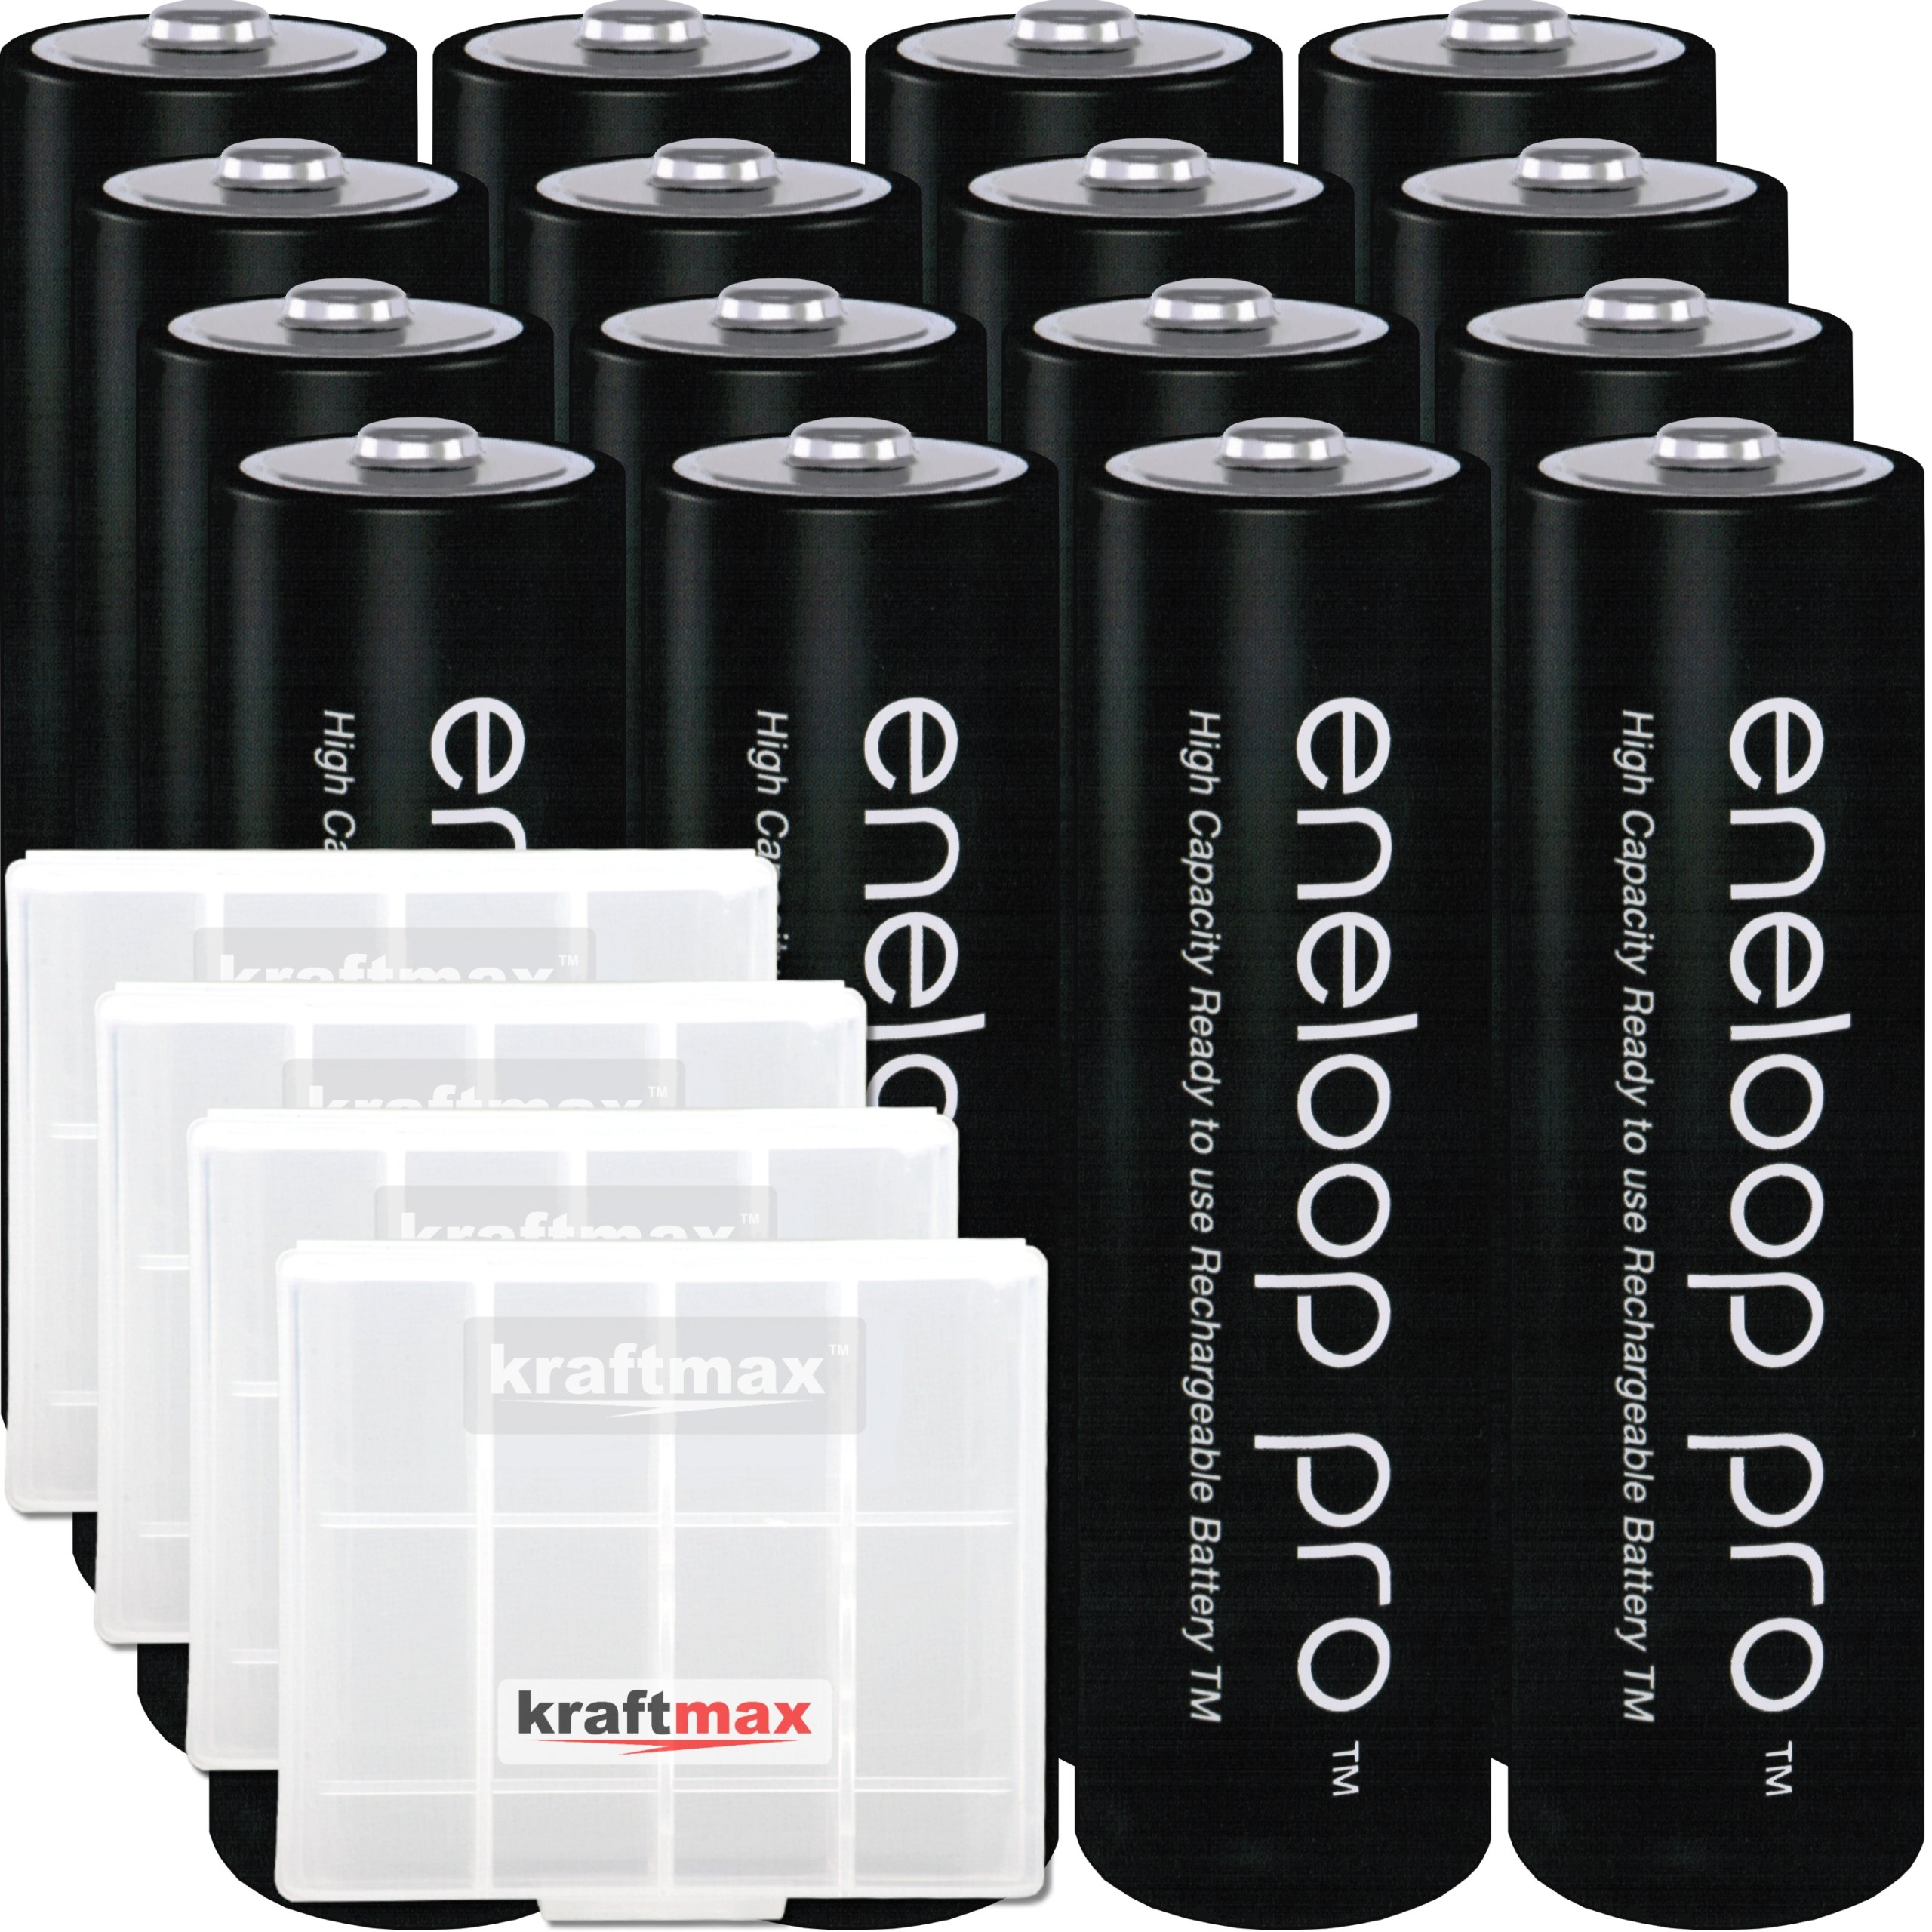 Kraftmax Eneloop Pro XX 16er-Pack: Amazon.es: Electrónica